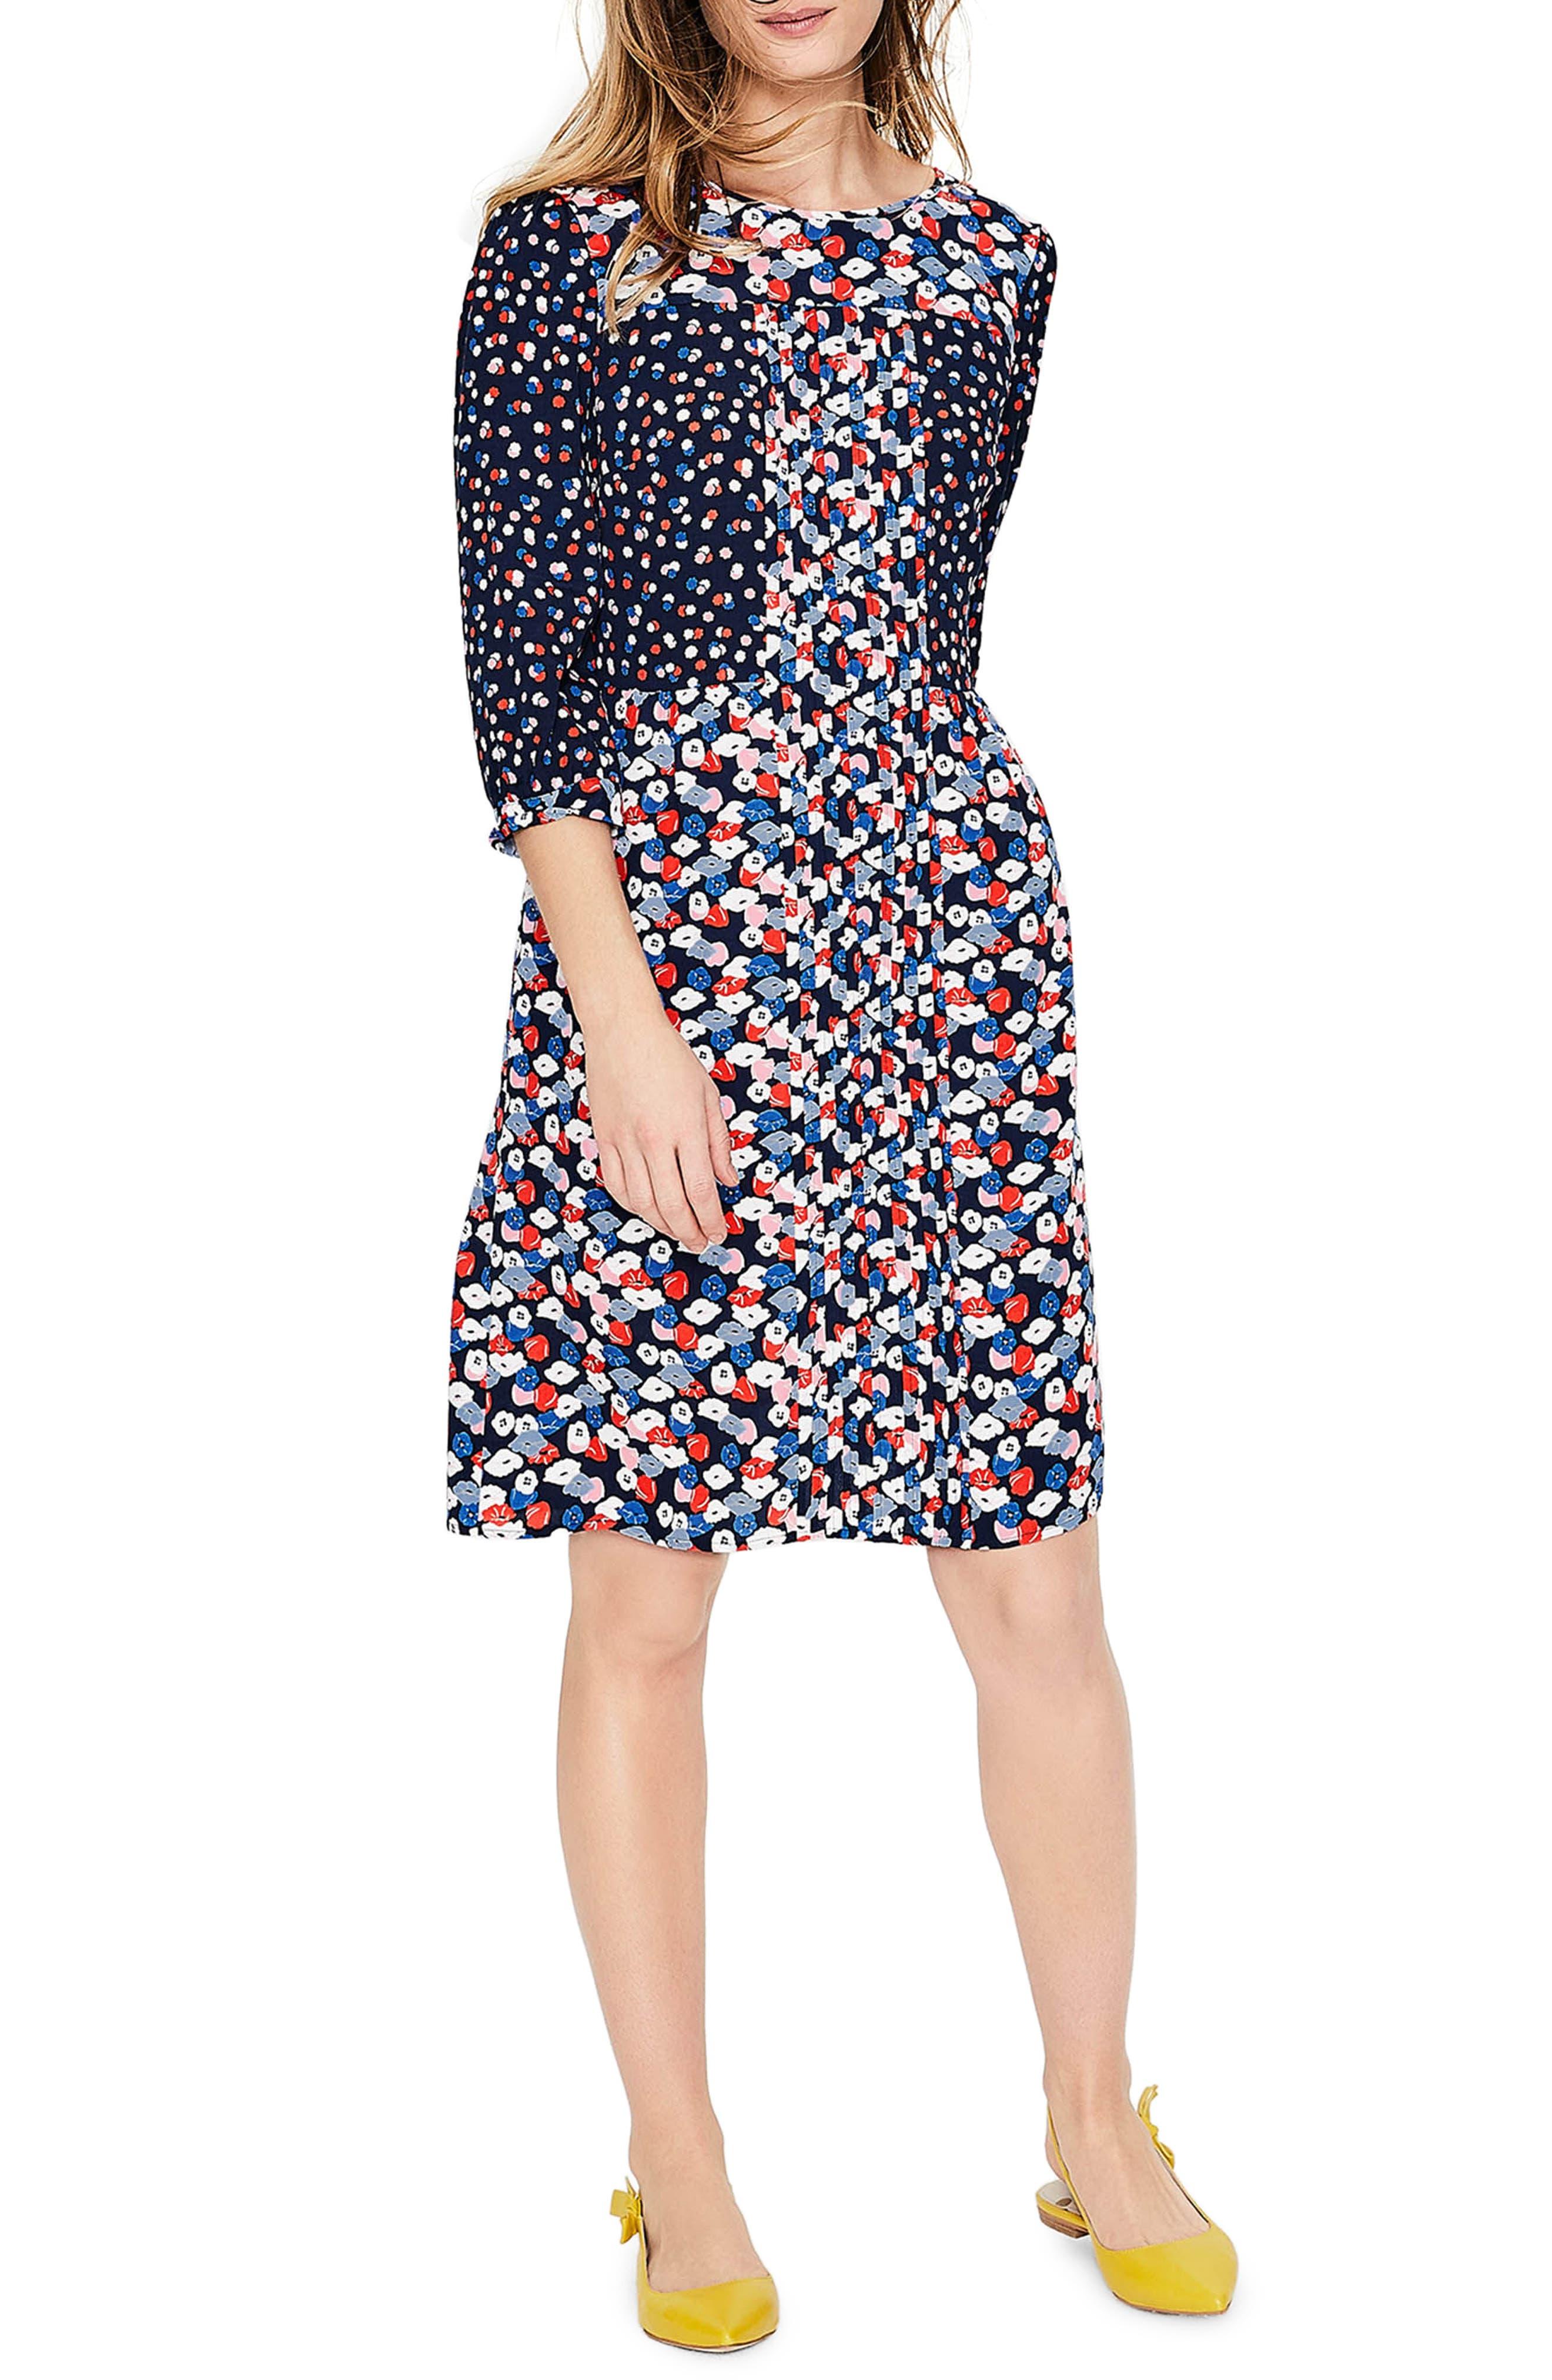 Hotchpotch Pattern Mix Pintuck Dress,                             Main thumbnail 1, color,                             486